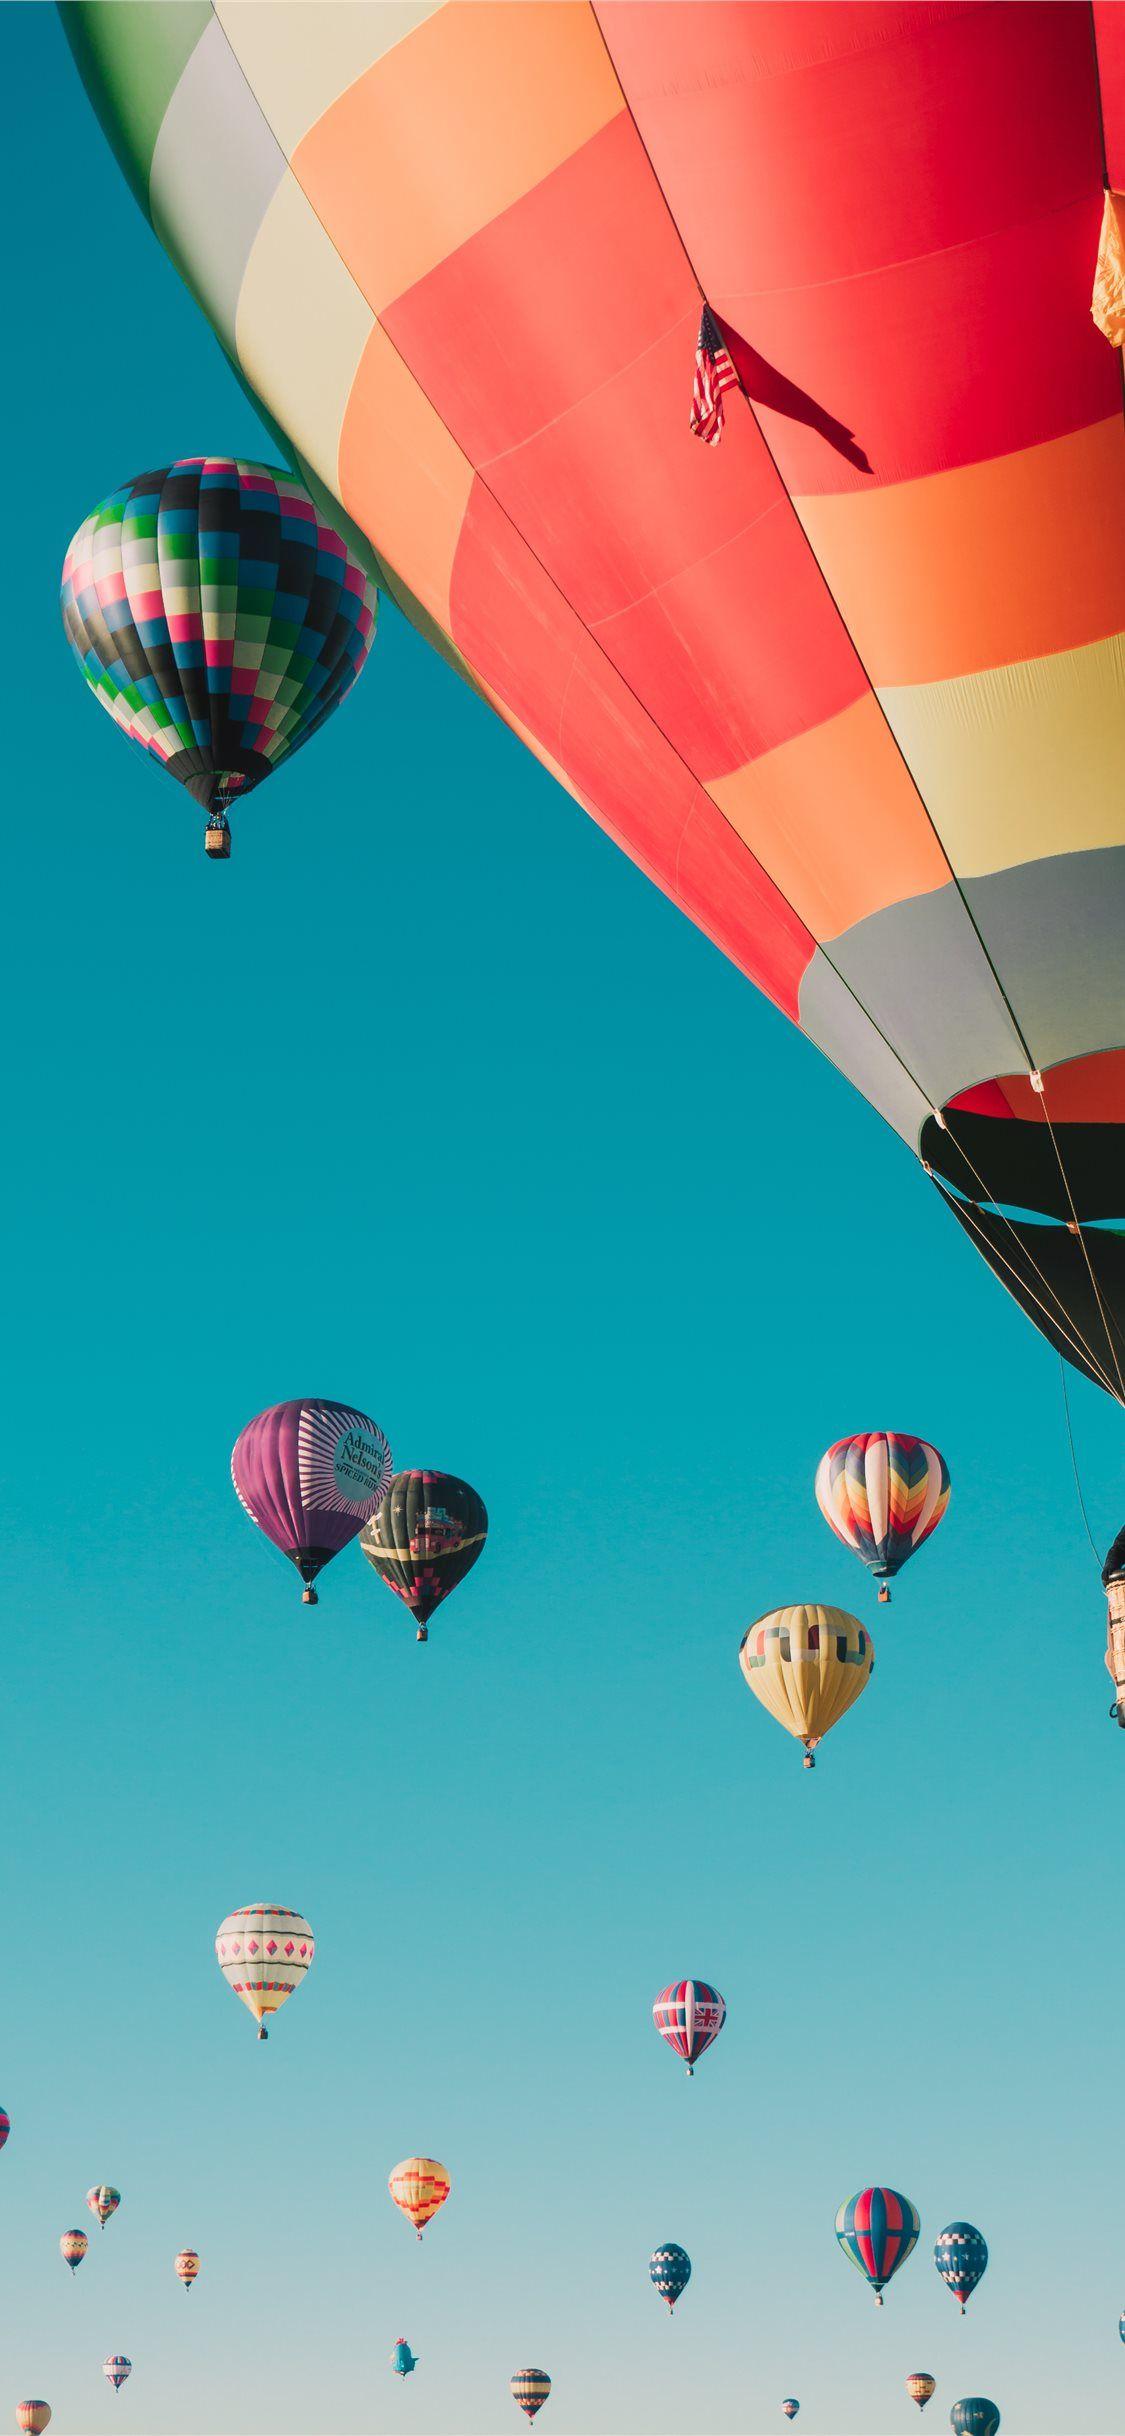 Hot Air Balloons Under Blue Sky Balloon Sky Flag Albuquerque Unitedstates Iphone11wal Iphone 11 Wallpaper Hot Air Balloon Wallpaper Air Balloon Wallpaper